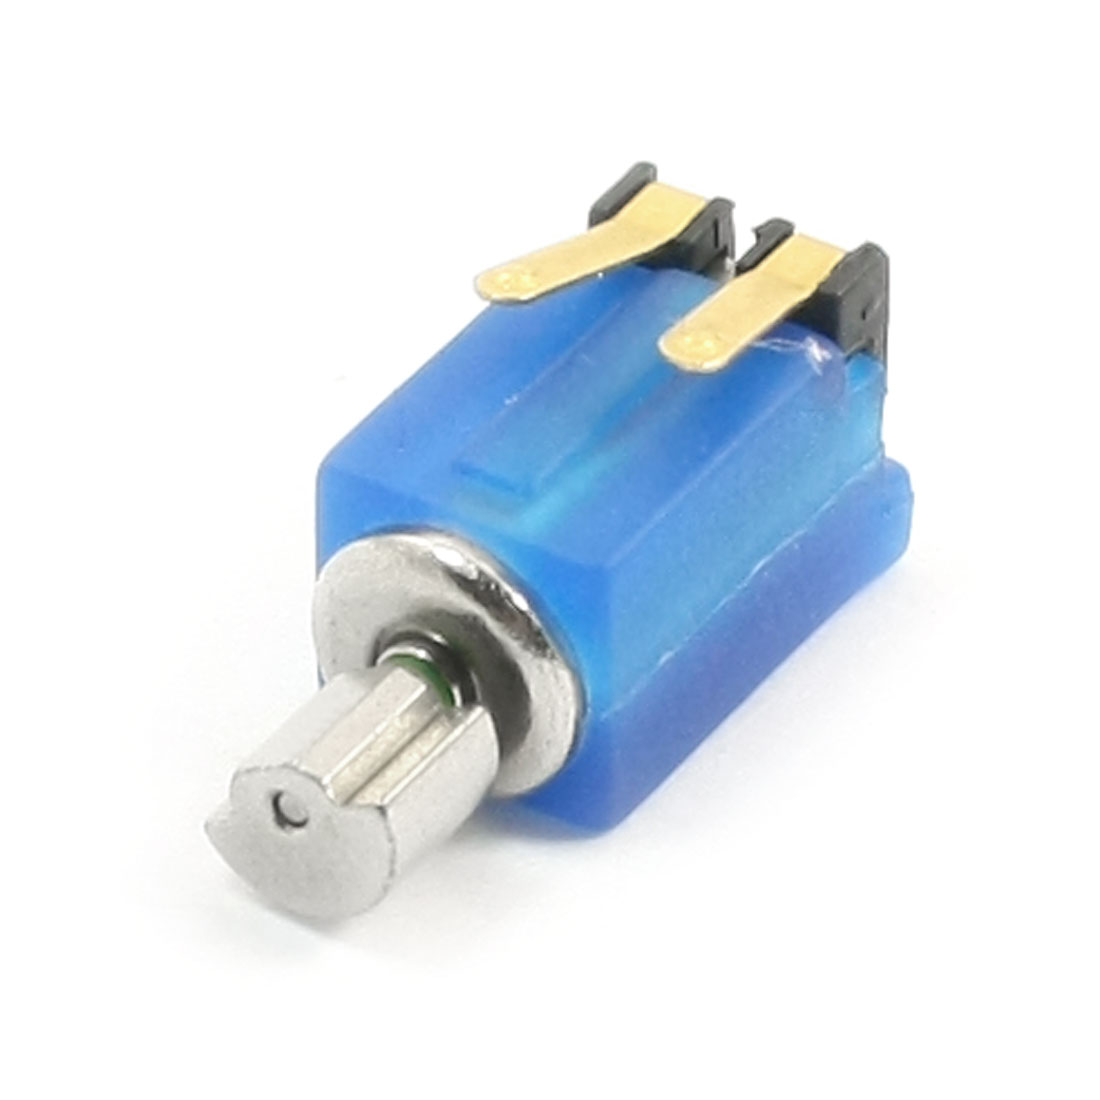 Replacement 3V 12000RPM 5mm Shaft High Torque Mini DC Vibration Motor